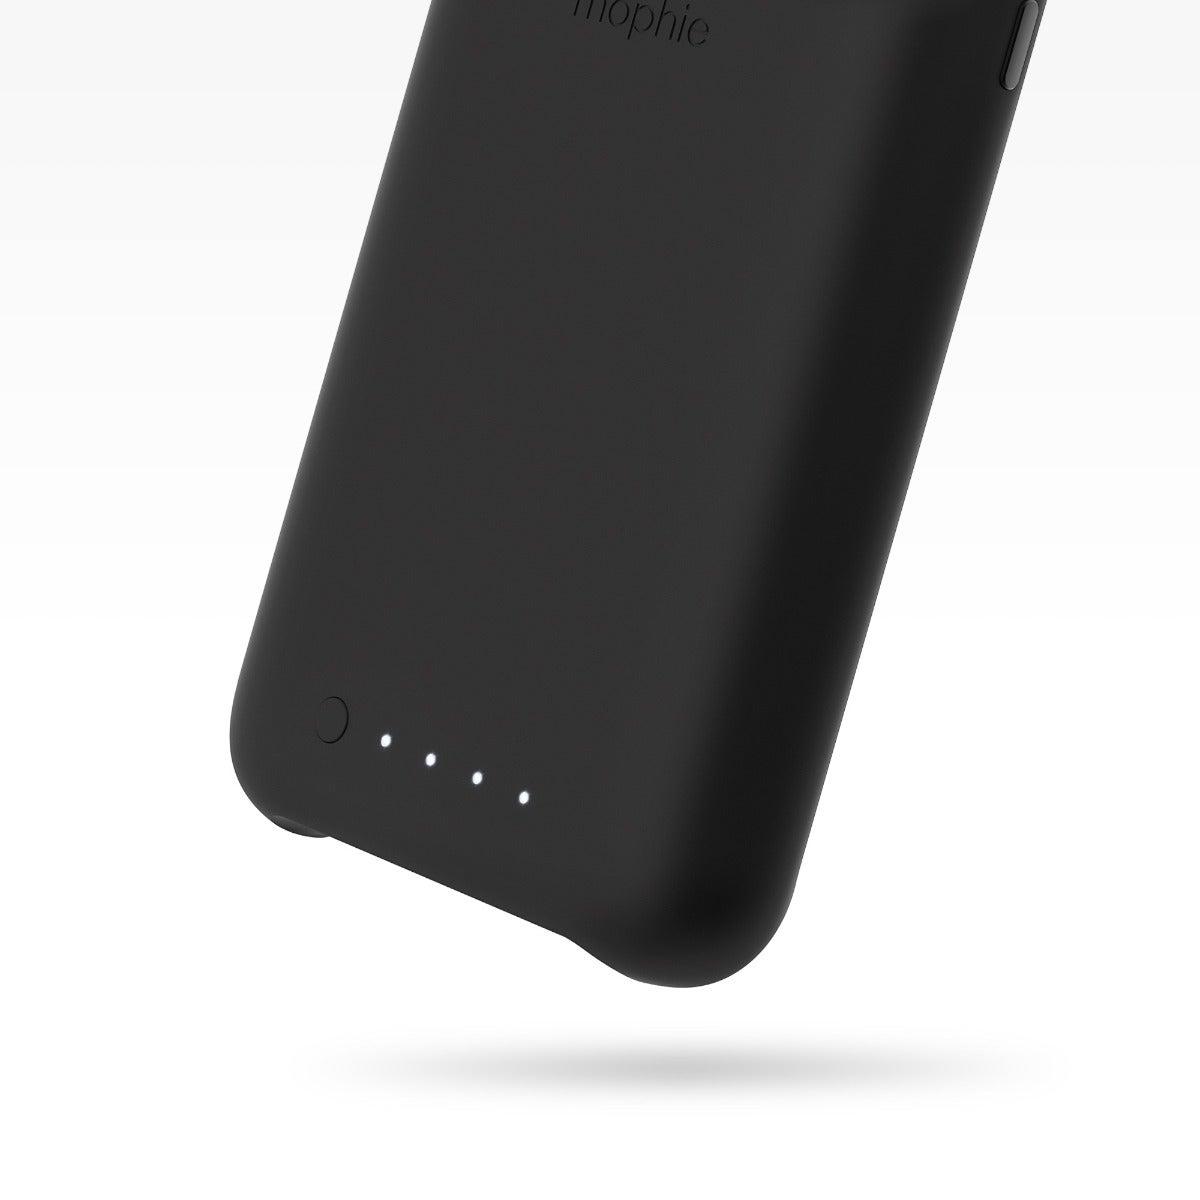 پاور بانک و قاب شارژ موفی مدل Juice Pack Access برای آیفون 11 Pro